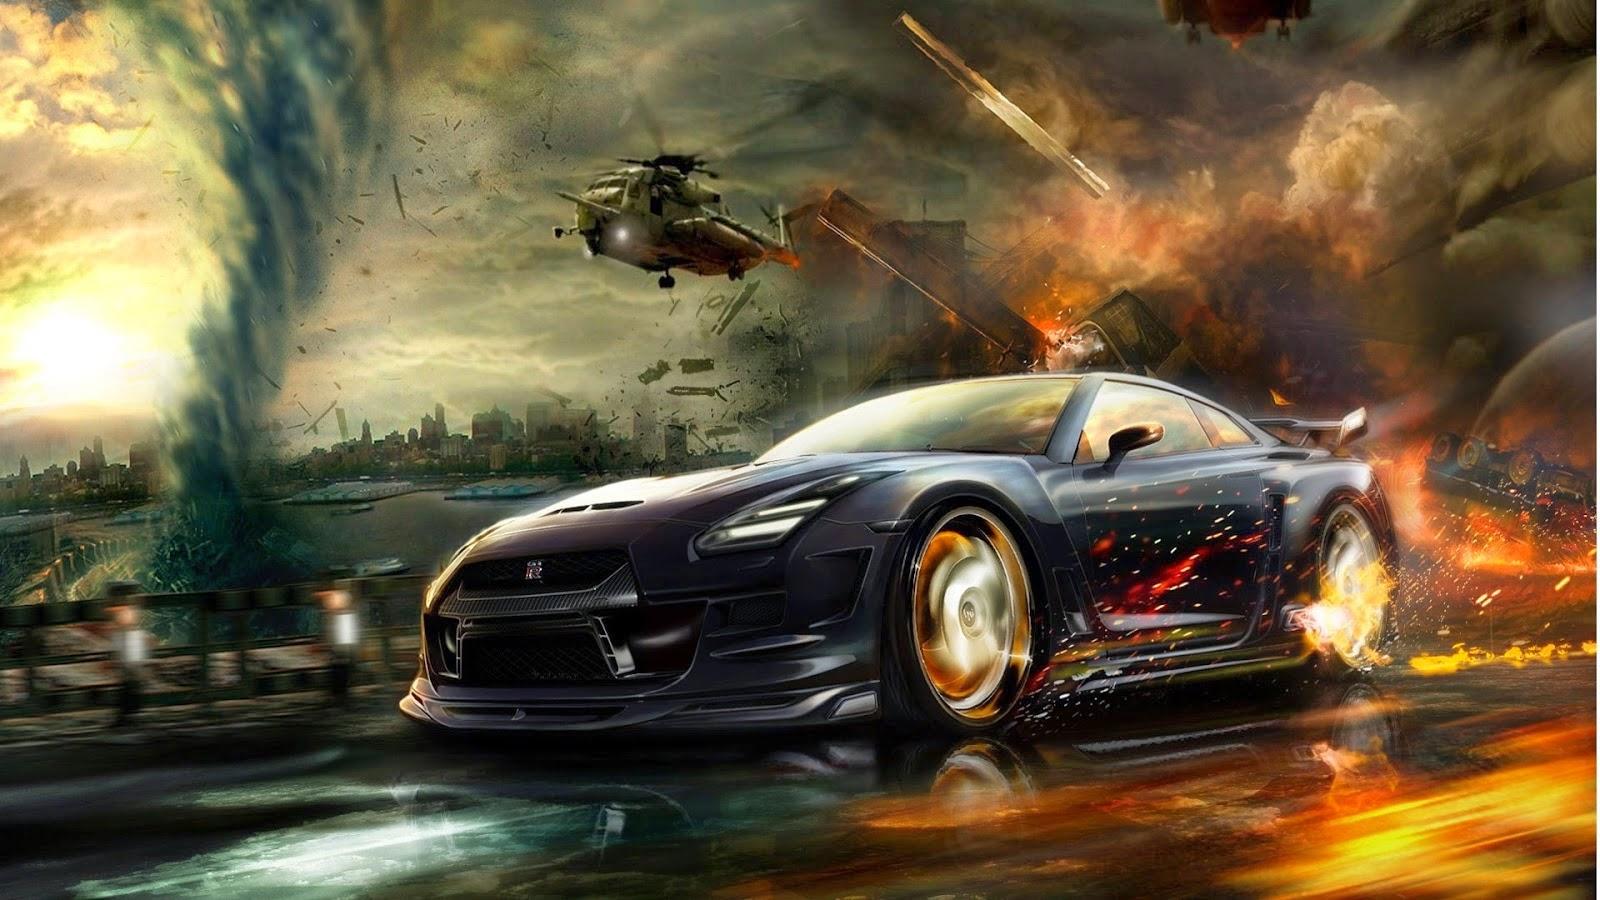 Coole Auto Spiele